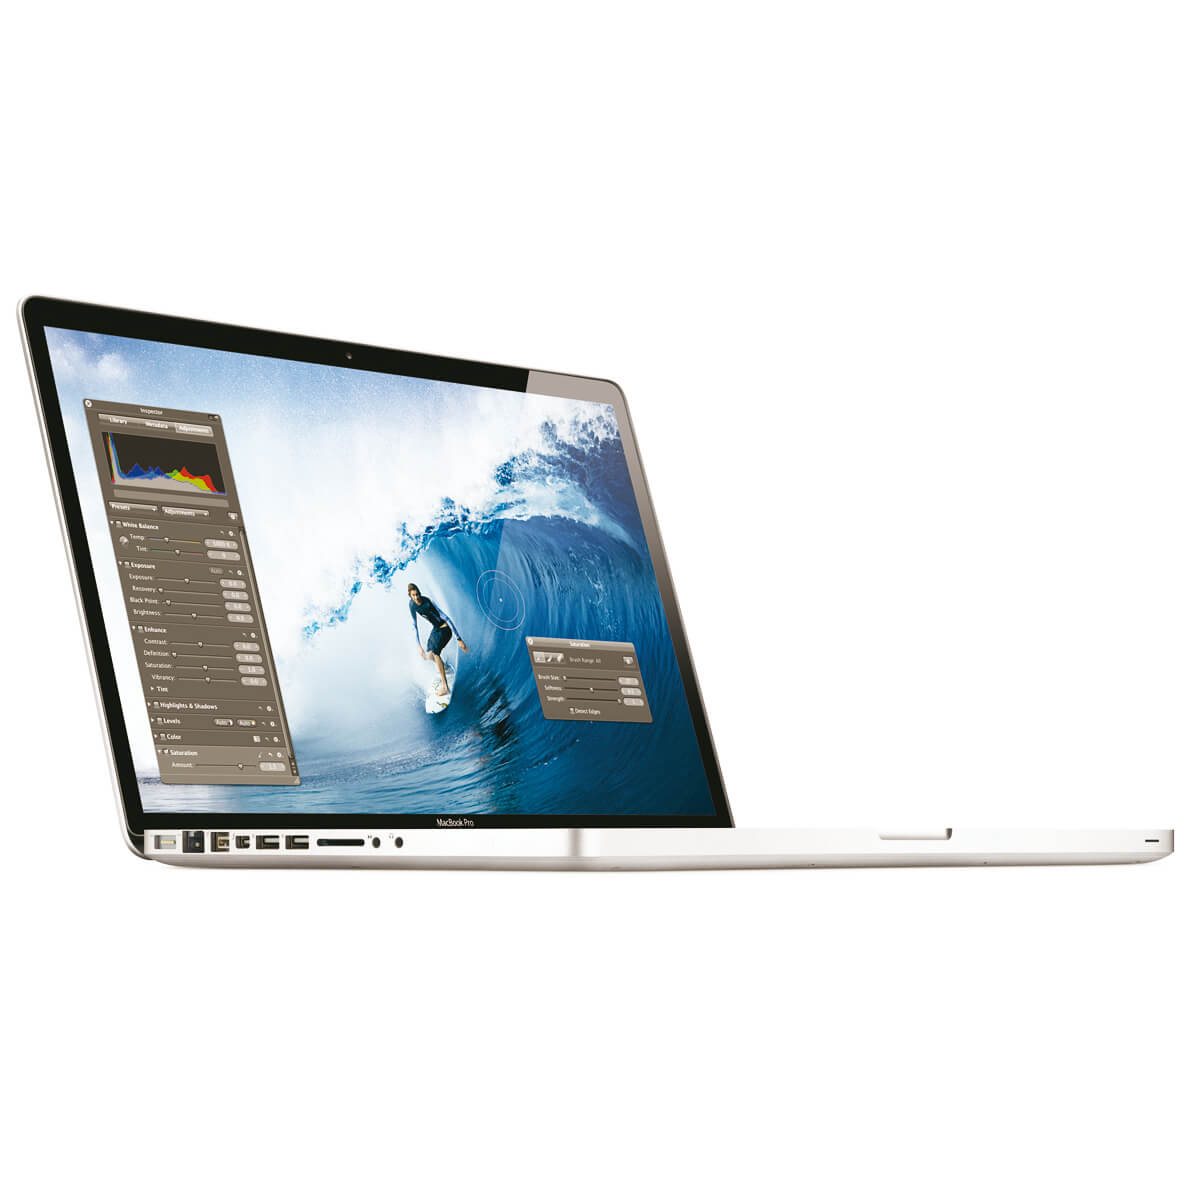 "Refurbished Apple MacBook Pro 15.4"" Laptop Intel i7 Quad Core 2GHz 4GB 500GB - MC721LLA"